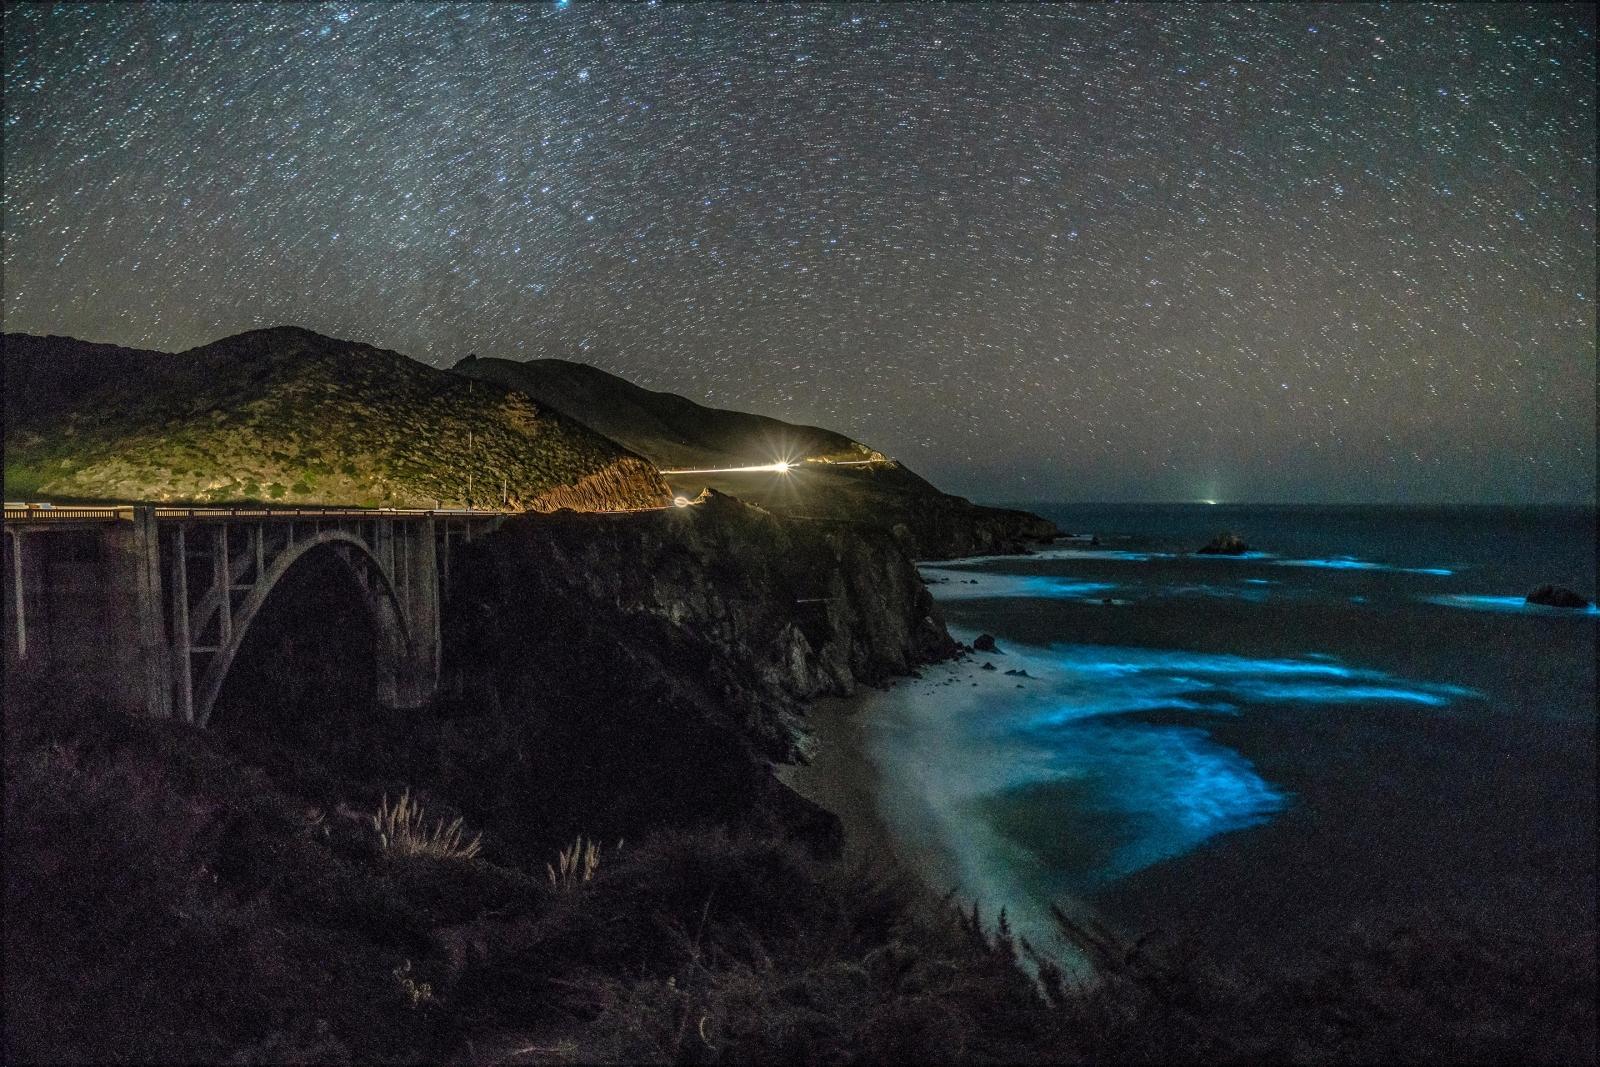 bioluminescent phytoplankton Big Sur California